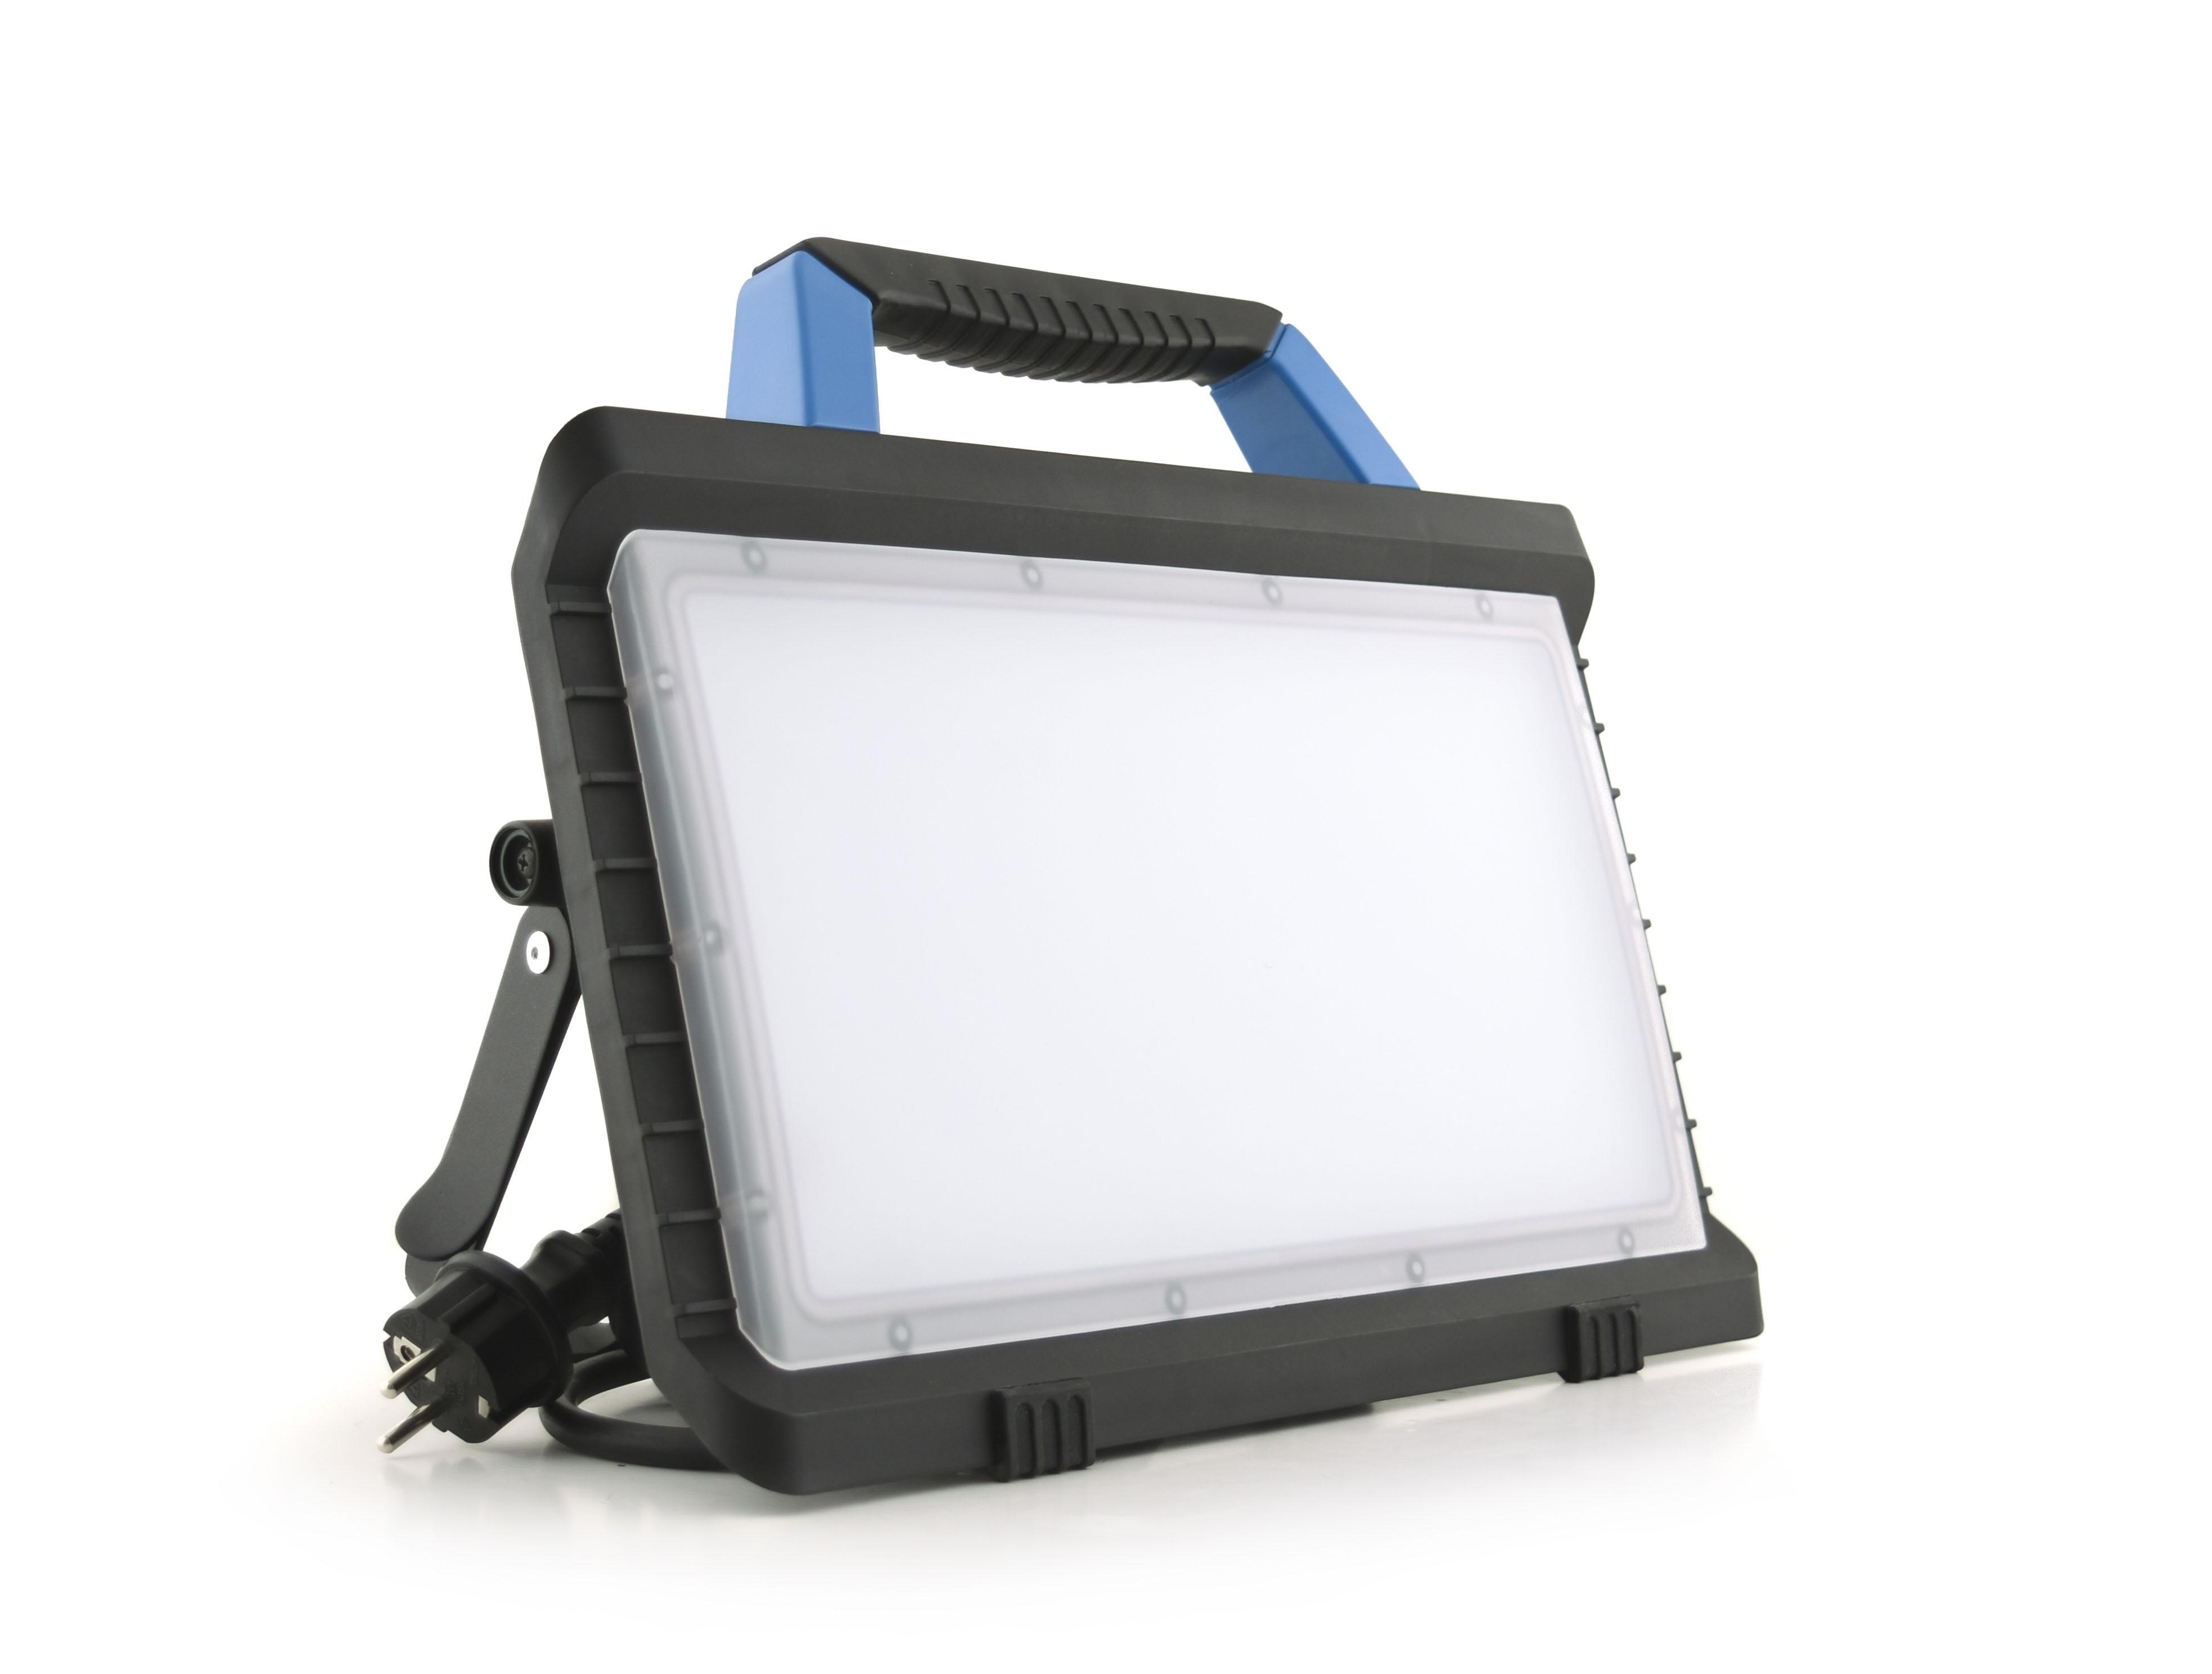 PP Galaxy led lamp 45w lm 32245